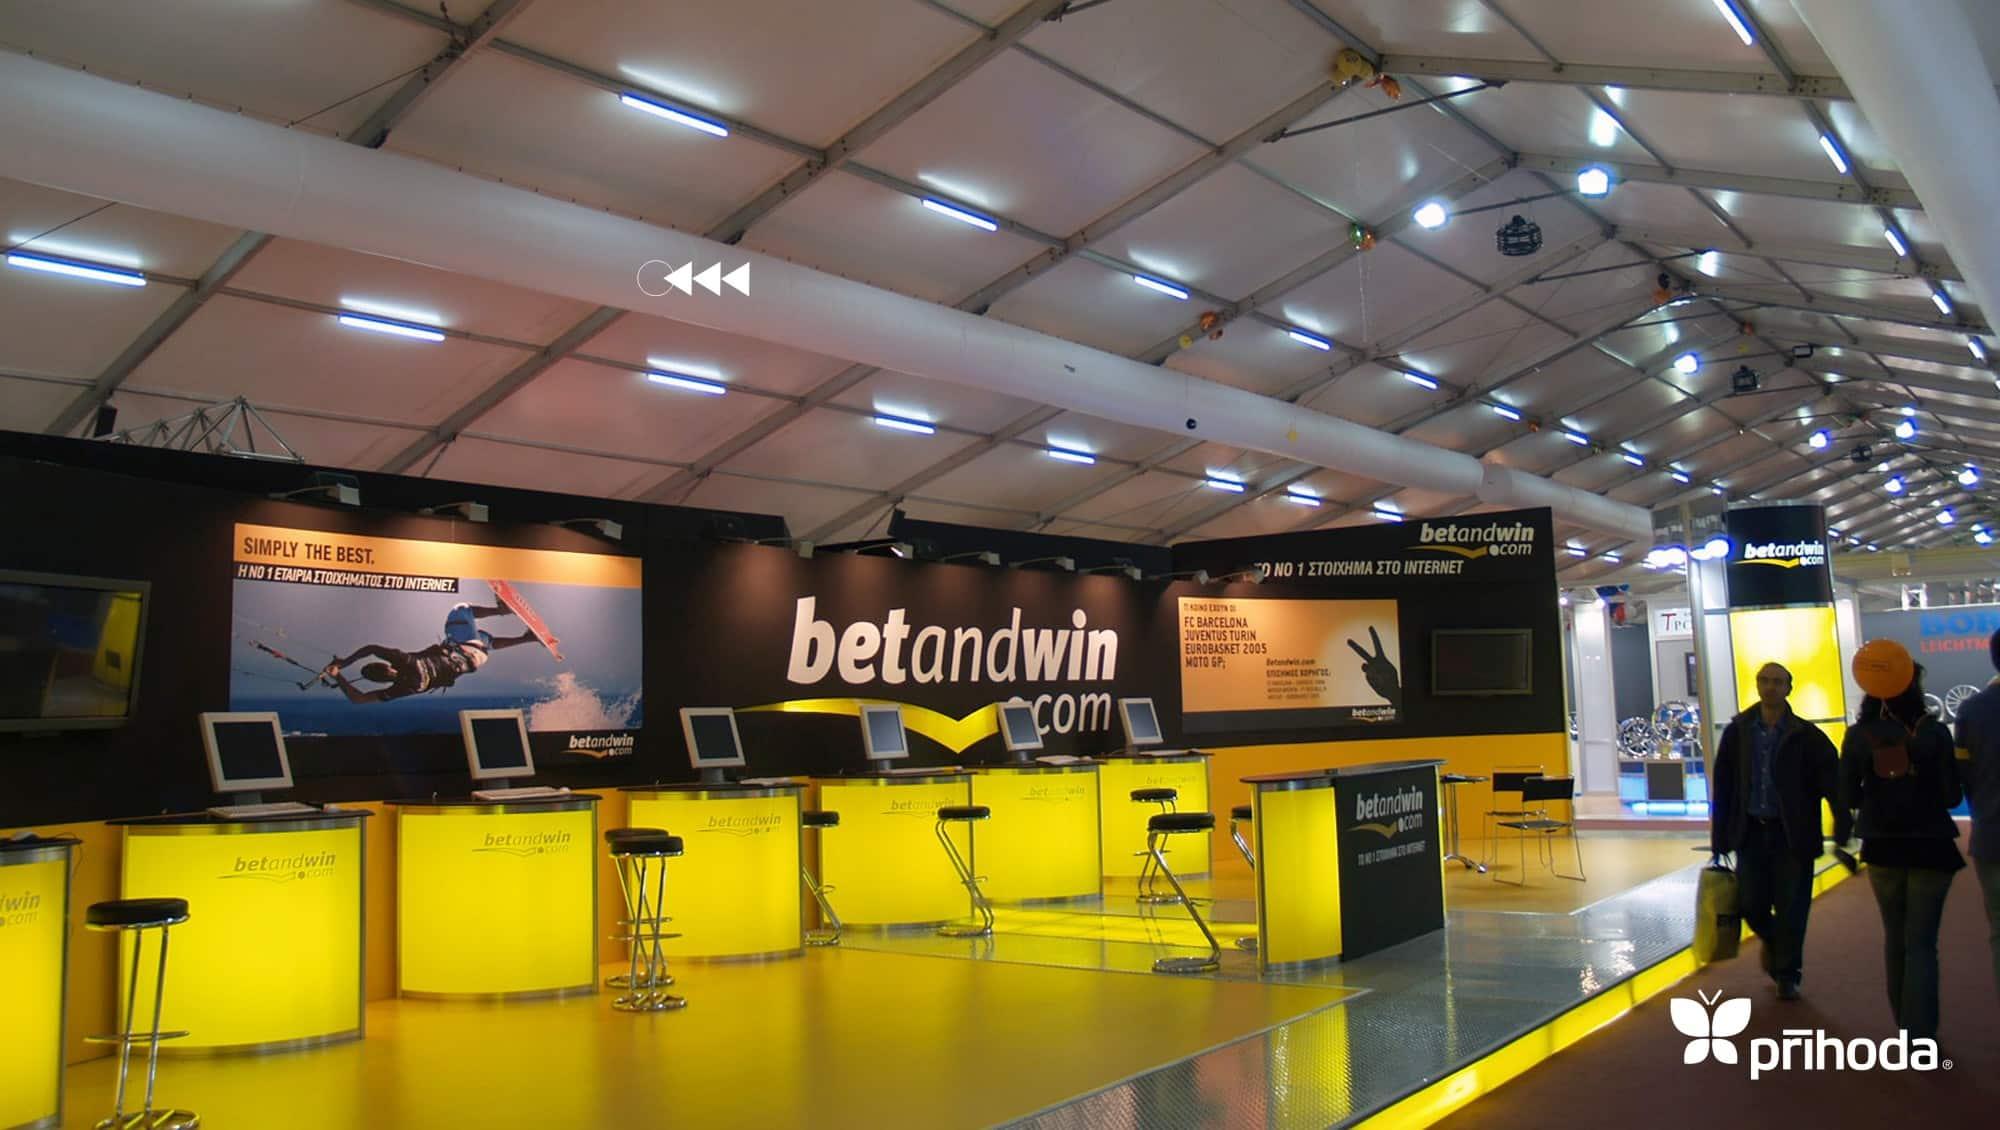 temporary ducting in exhibition venue